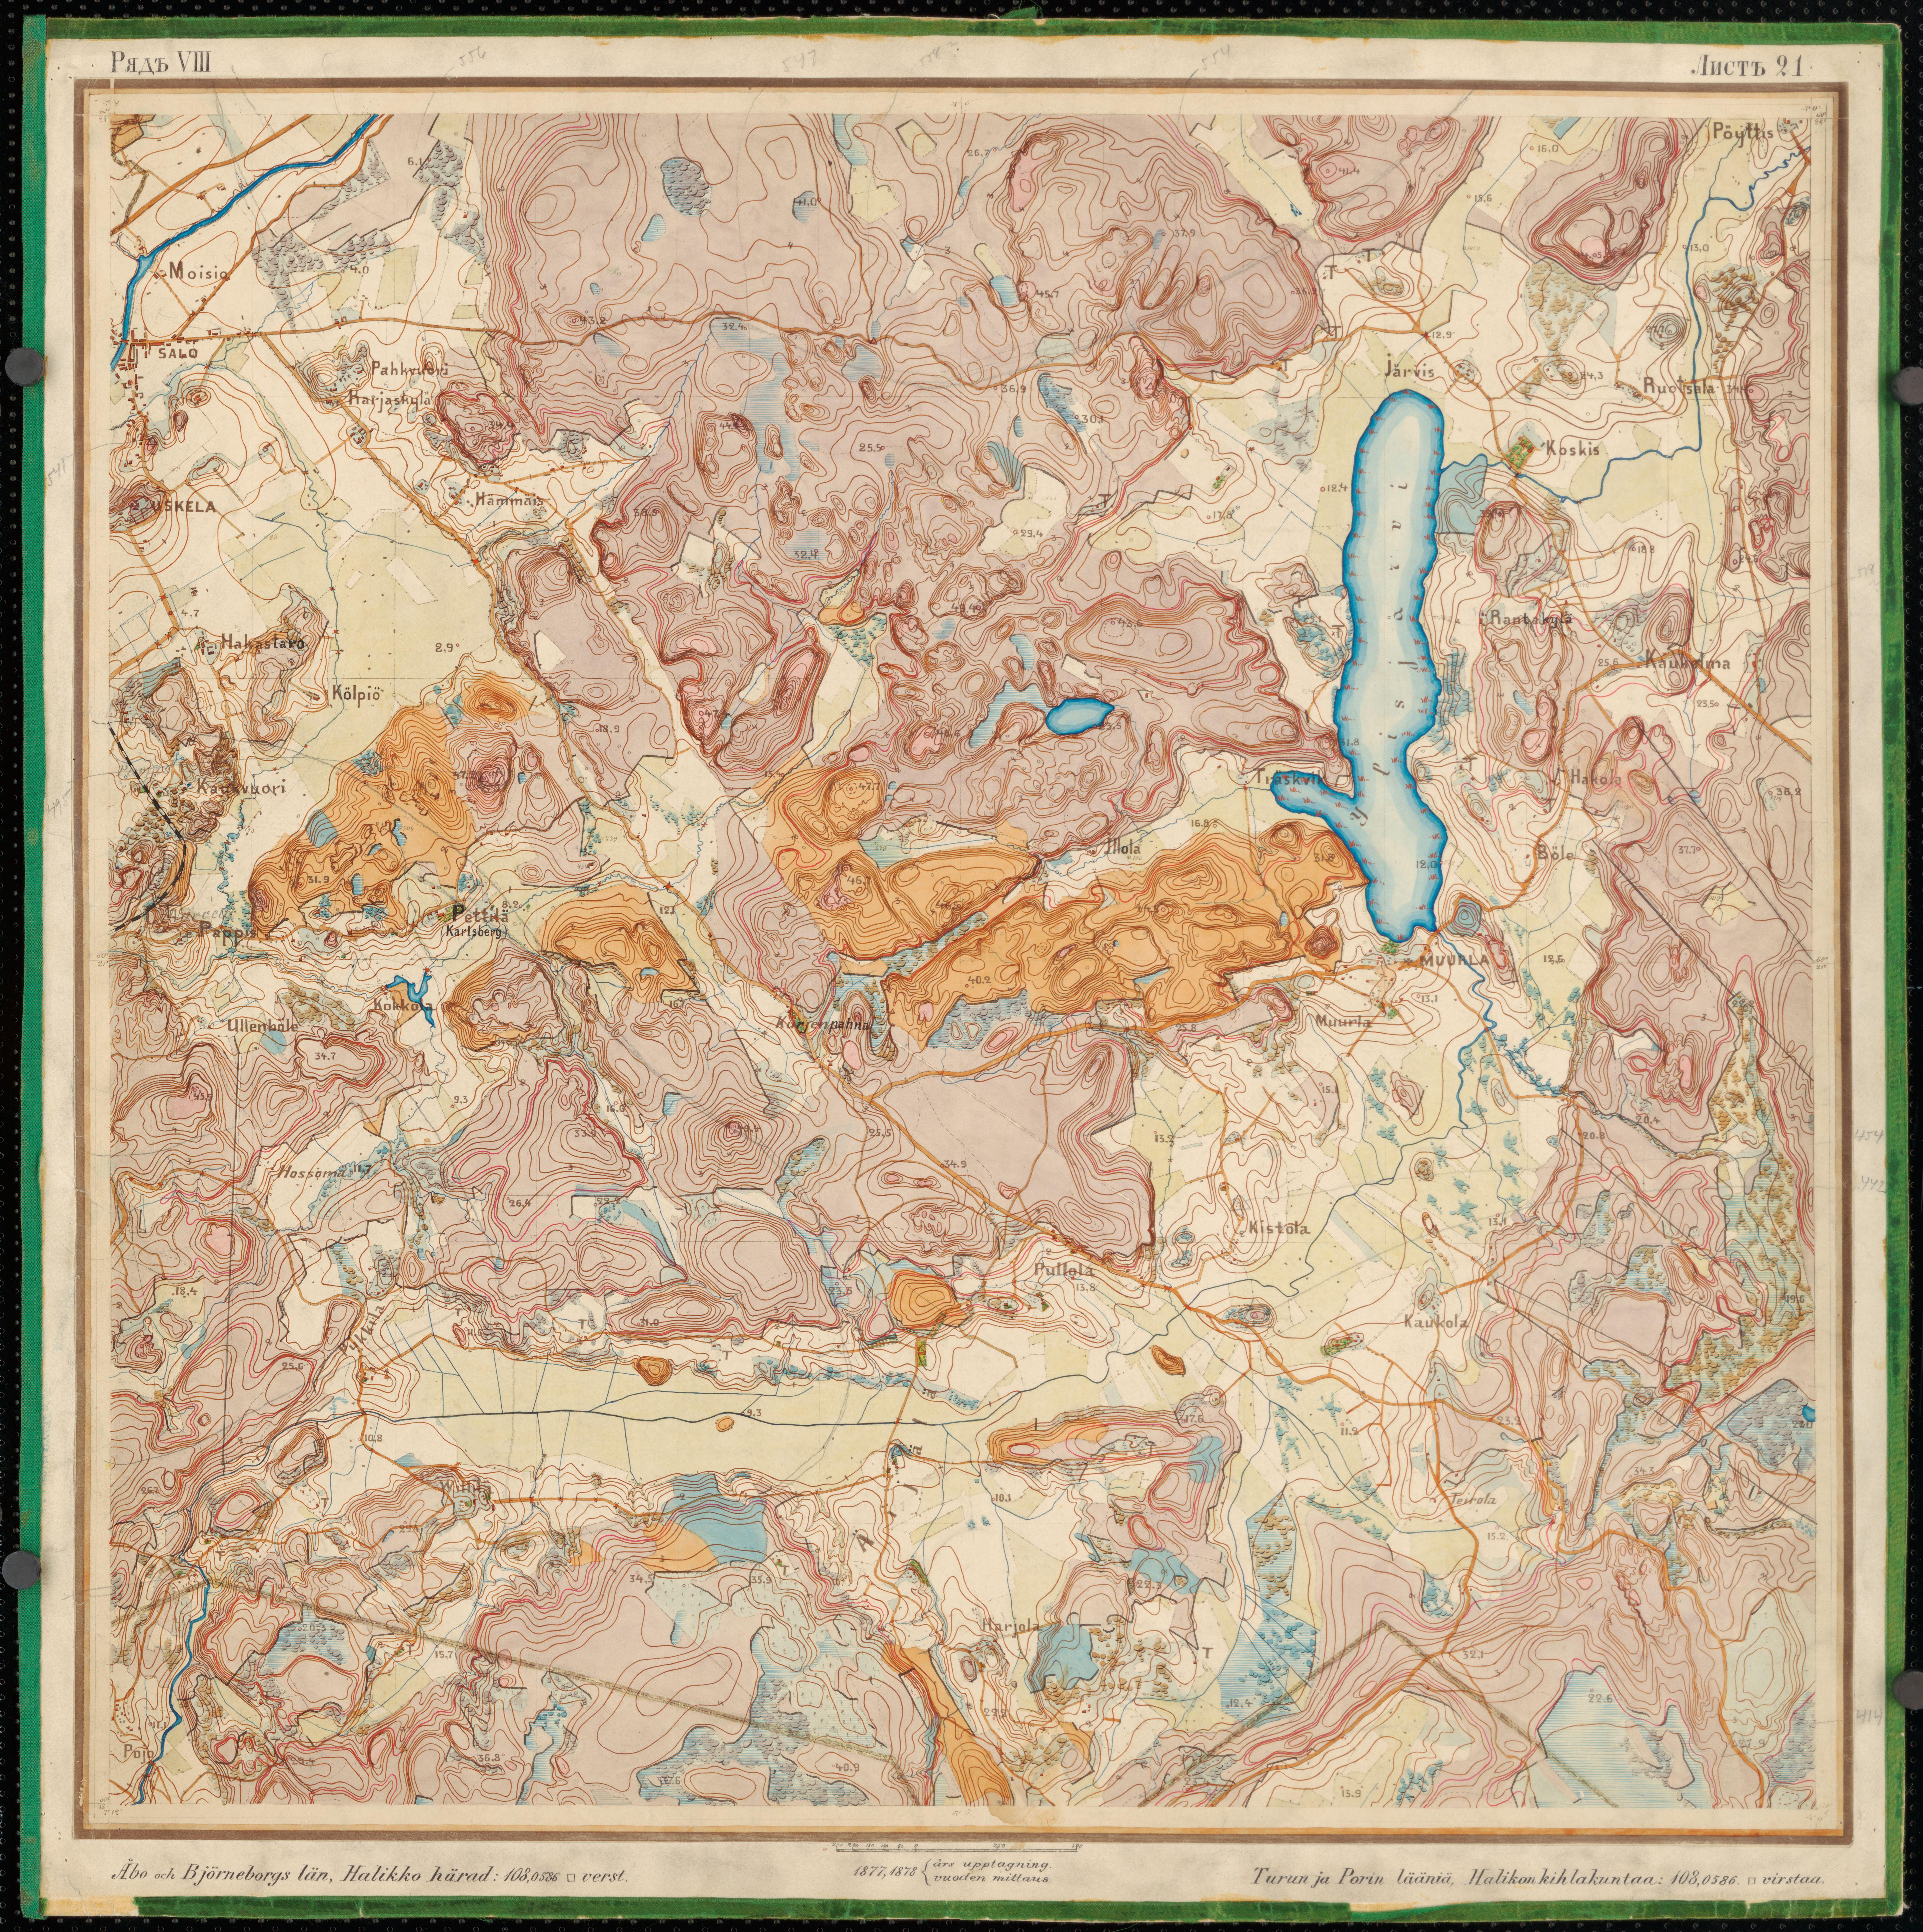 File Senate Atlas 1870 1907 Sheet Viii 21 Muurla Jpg Wikimedia